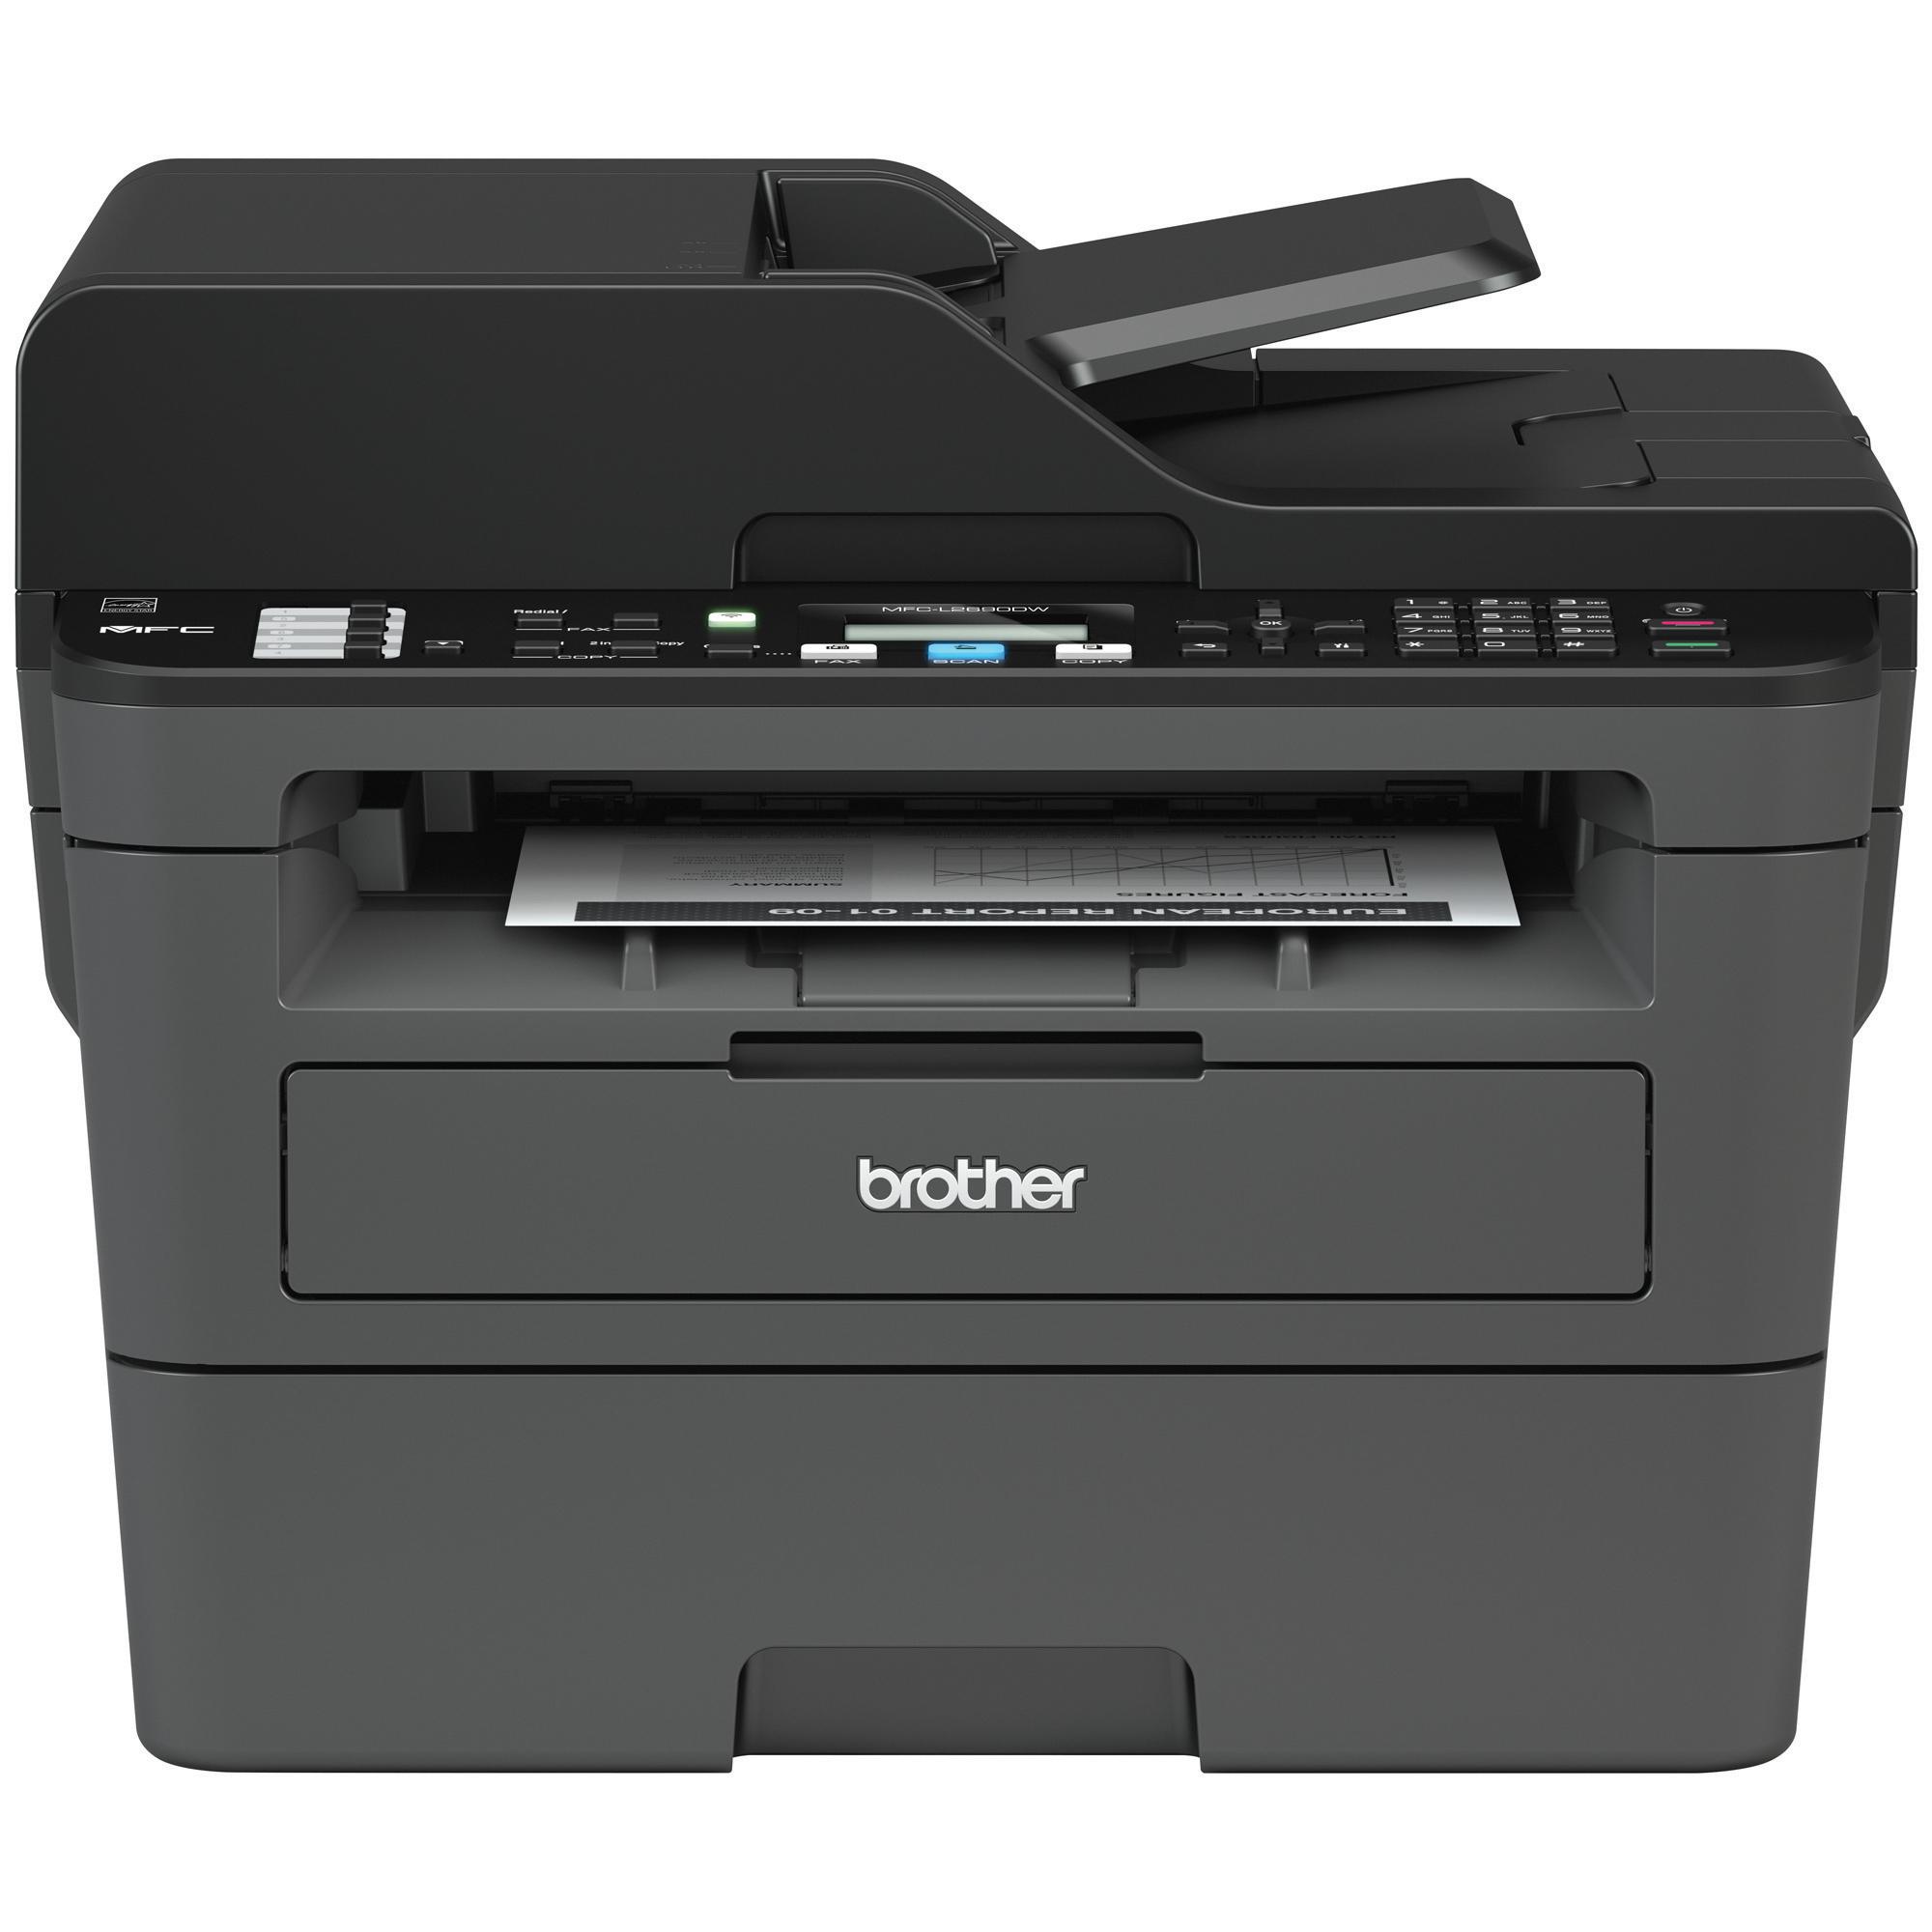 Brother MFC-L2690DW Monochrome Laser All-in-One Printer, Duplex Printing, Wireless Connectivity - YMMV Walmart.com $139